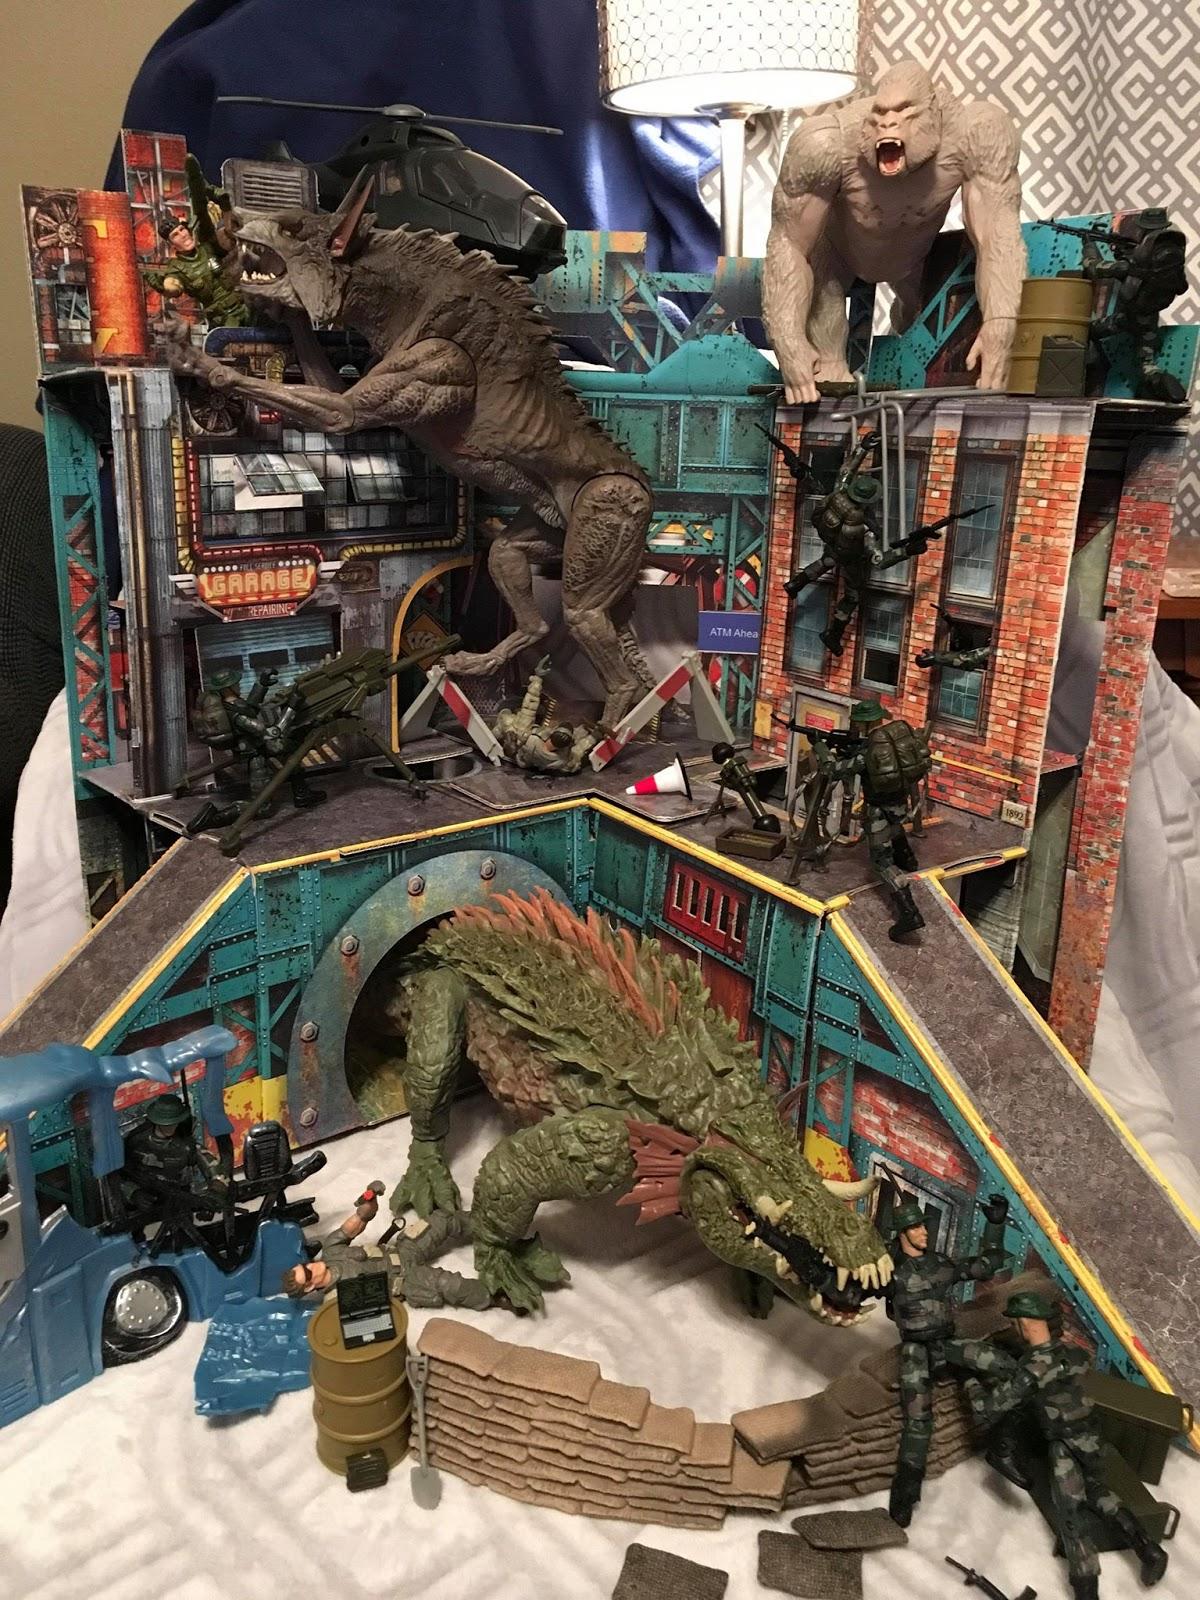 The Terrible Toyman Rampage